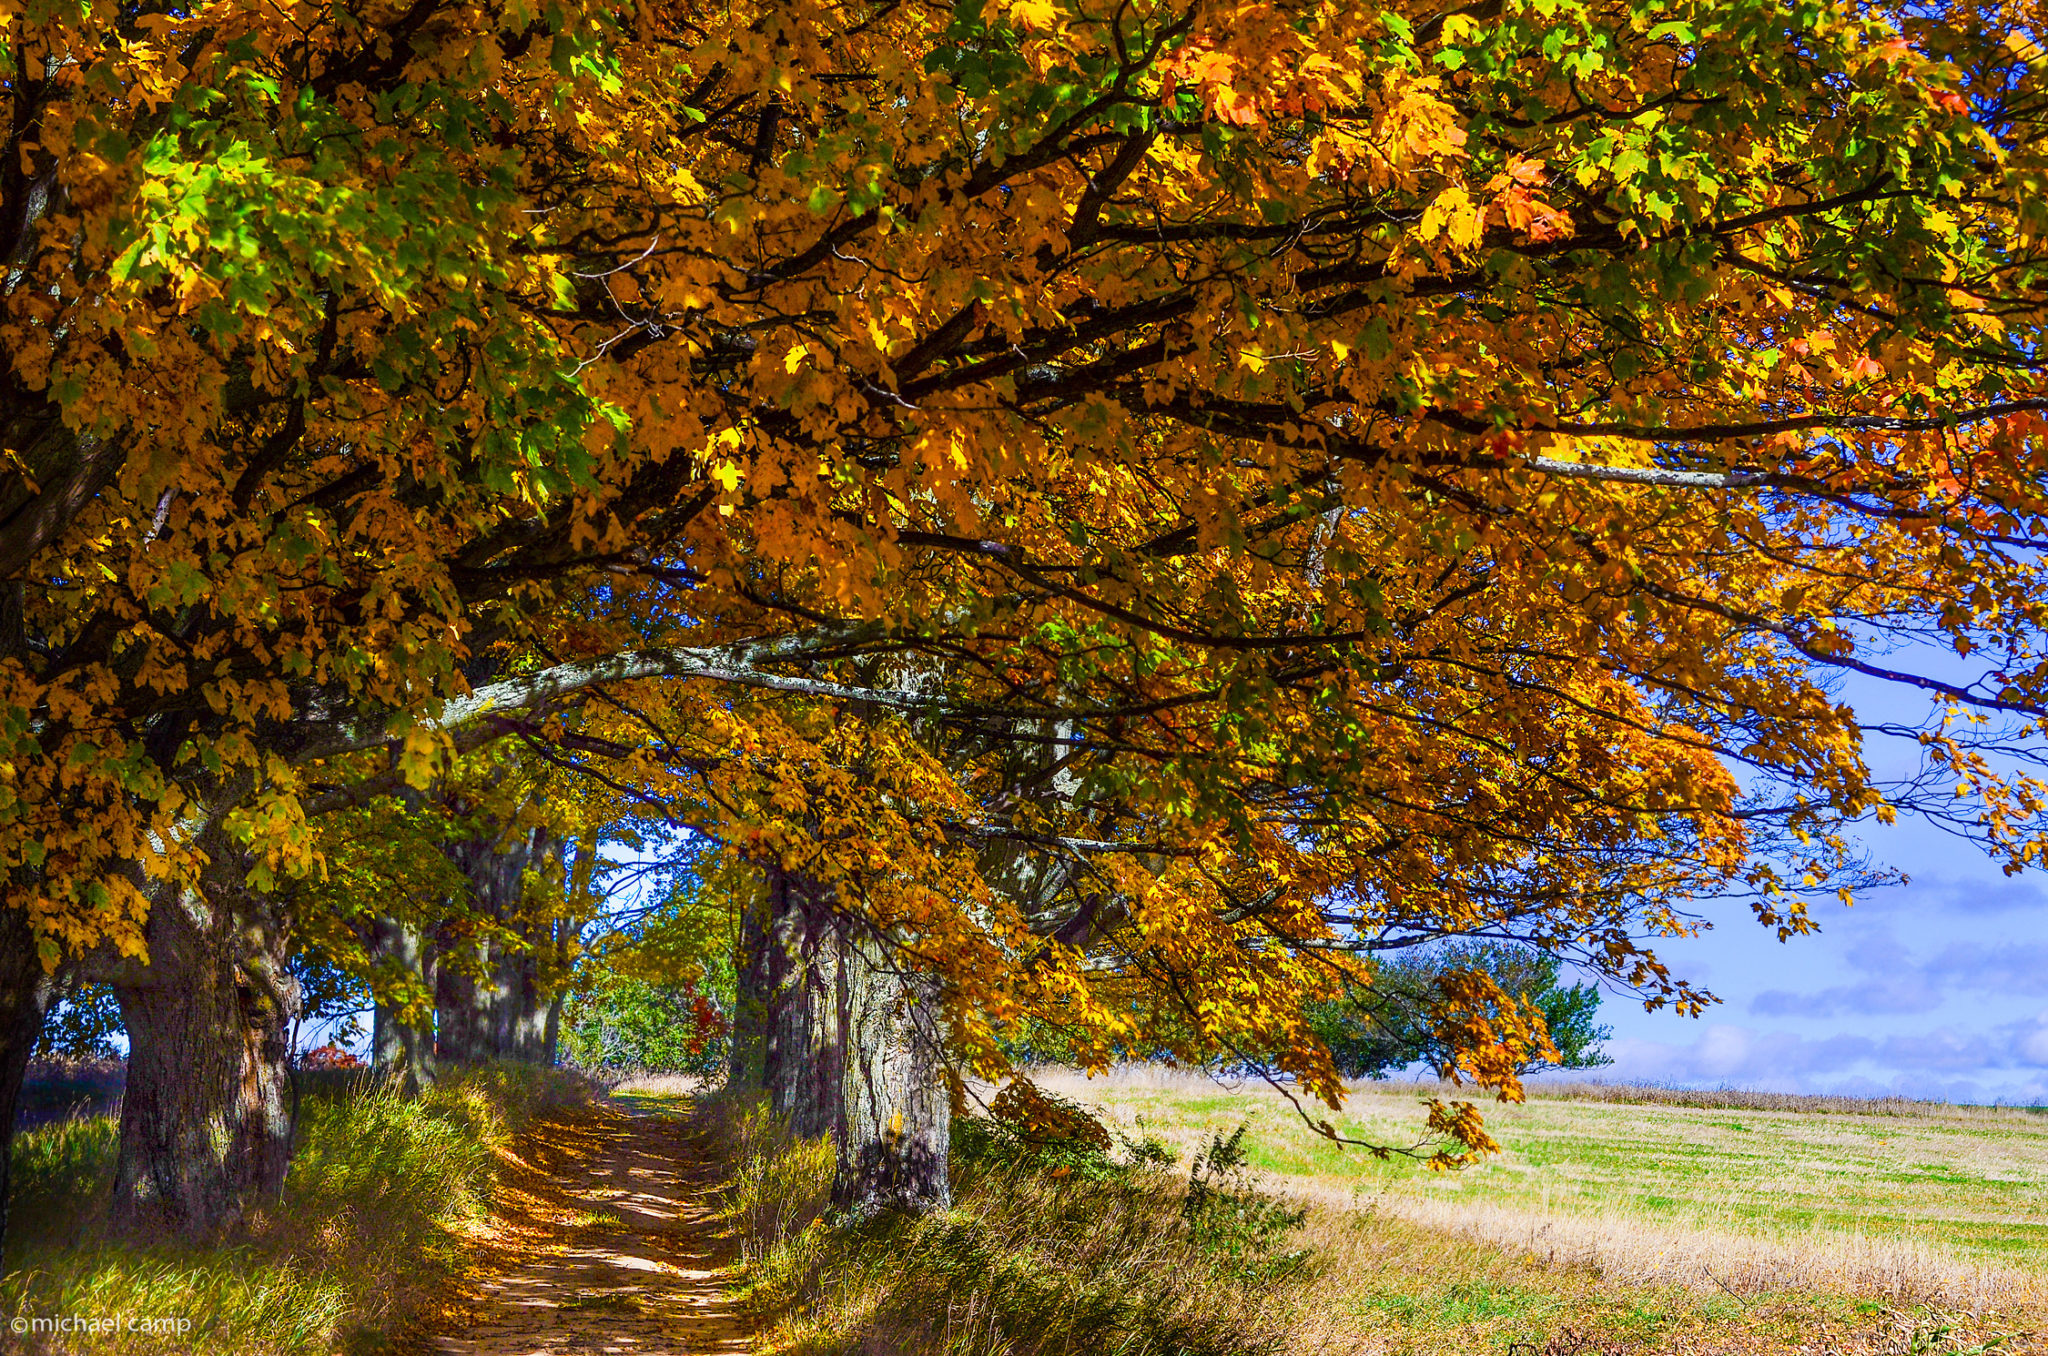 Shades of October